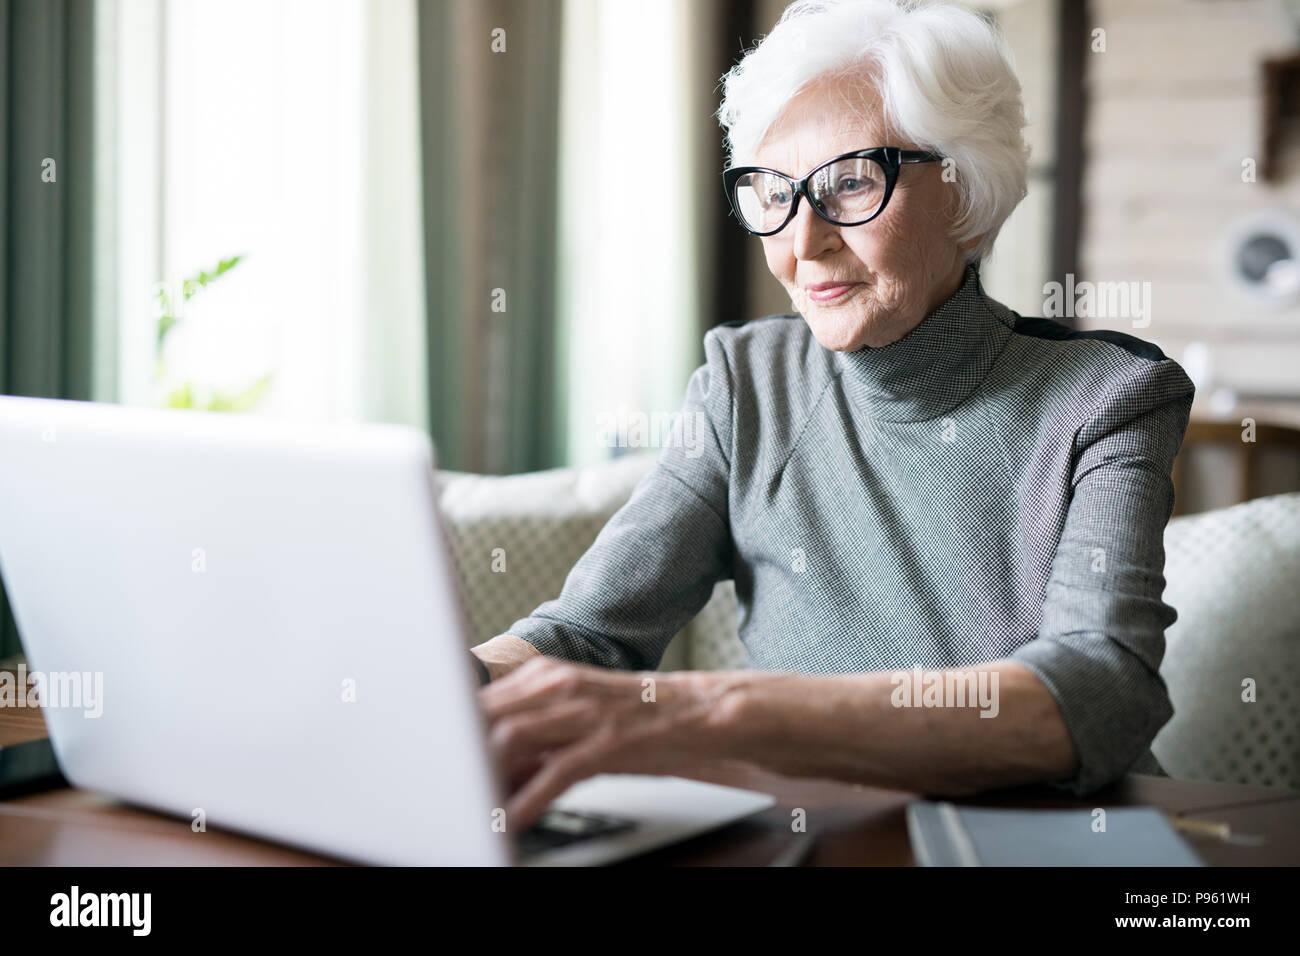 Ältere Frau, die Eingabe auf laptop Stockbild